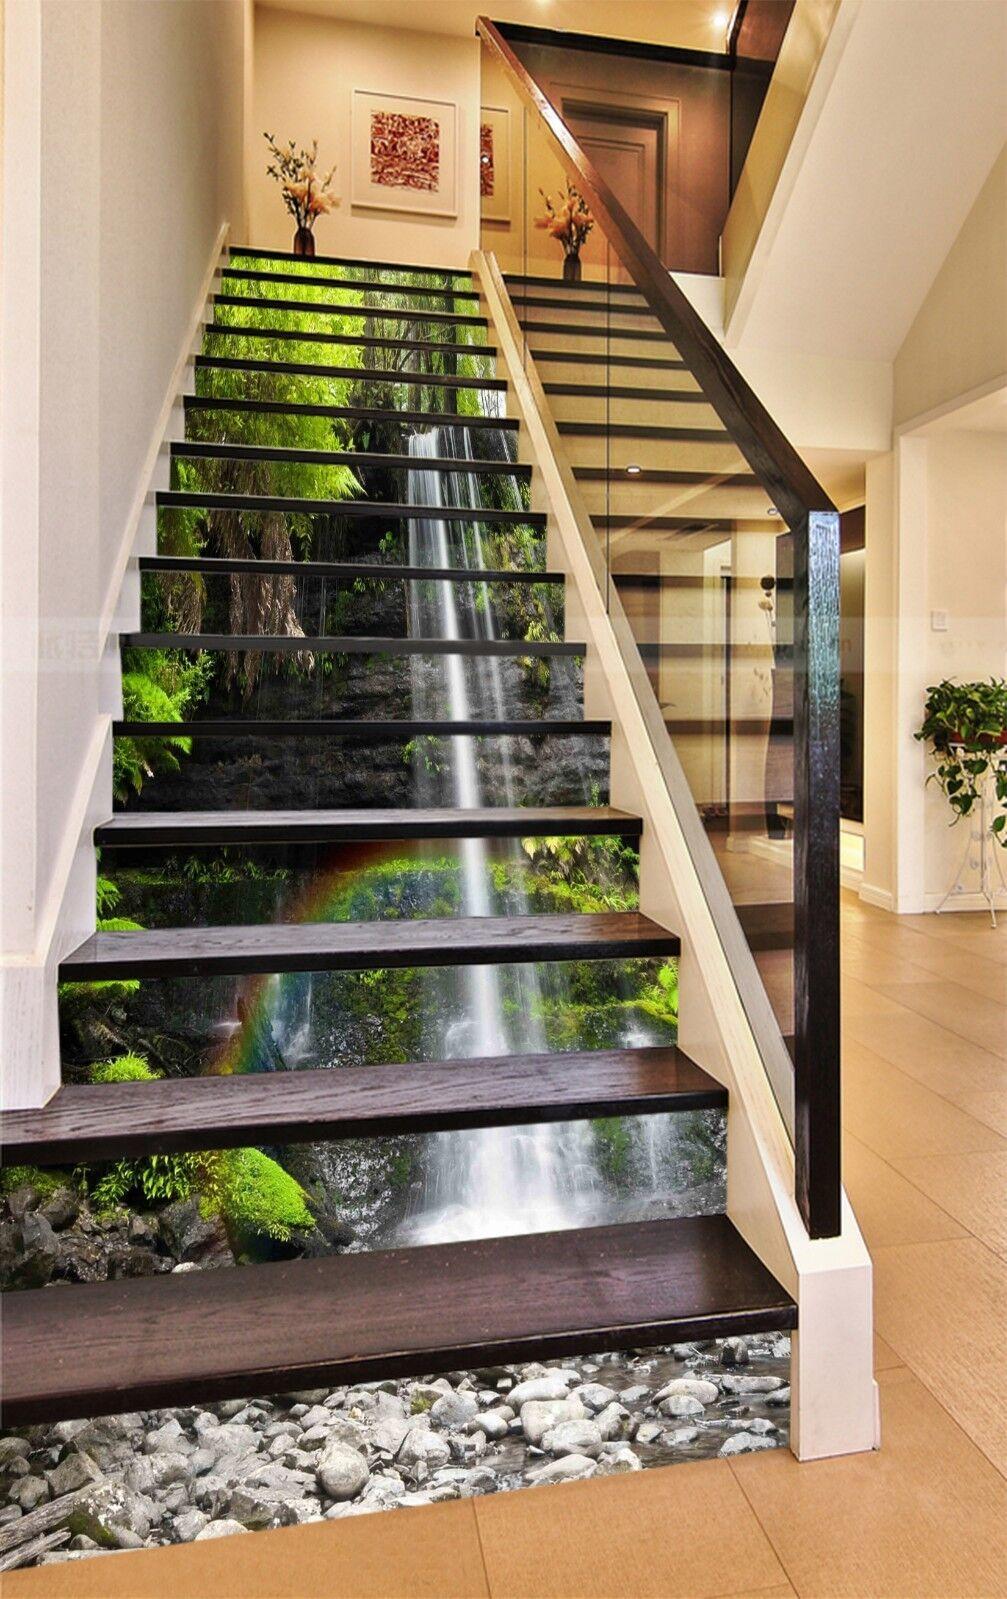 3D Stream Rainbow Stair Risers Decoration Photo Mural Vinyl Decal Wallpaper CA